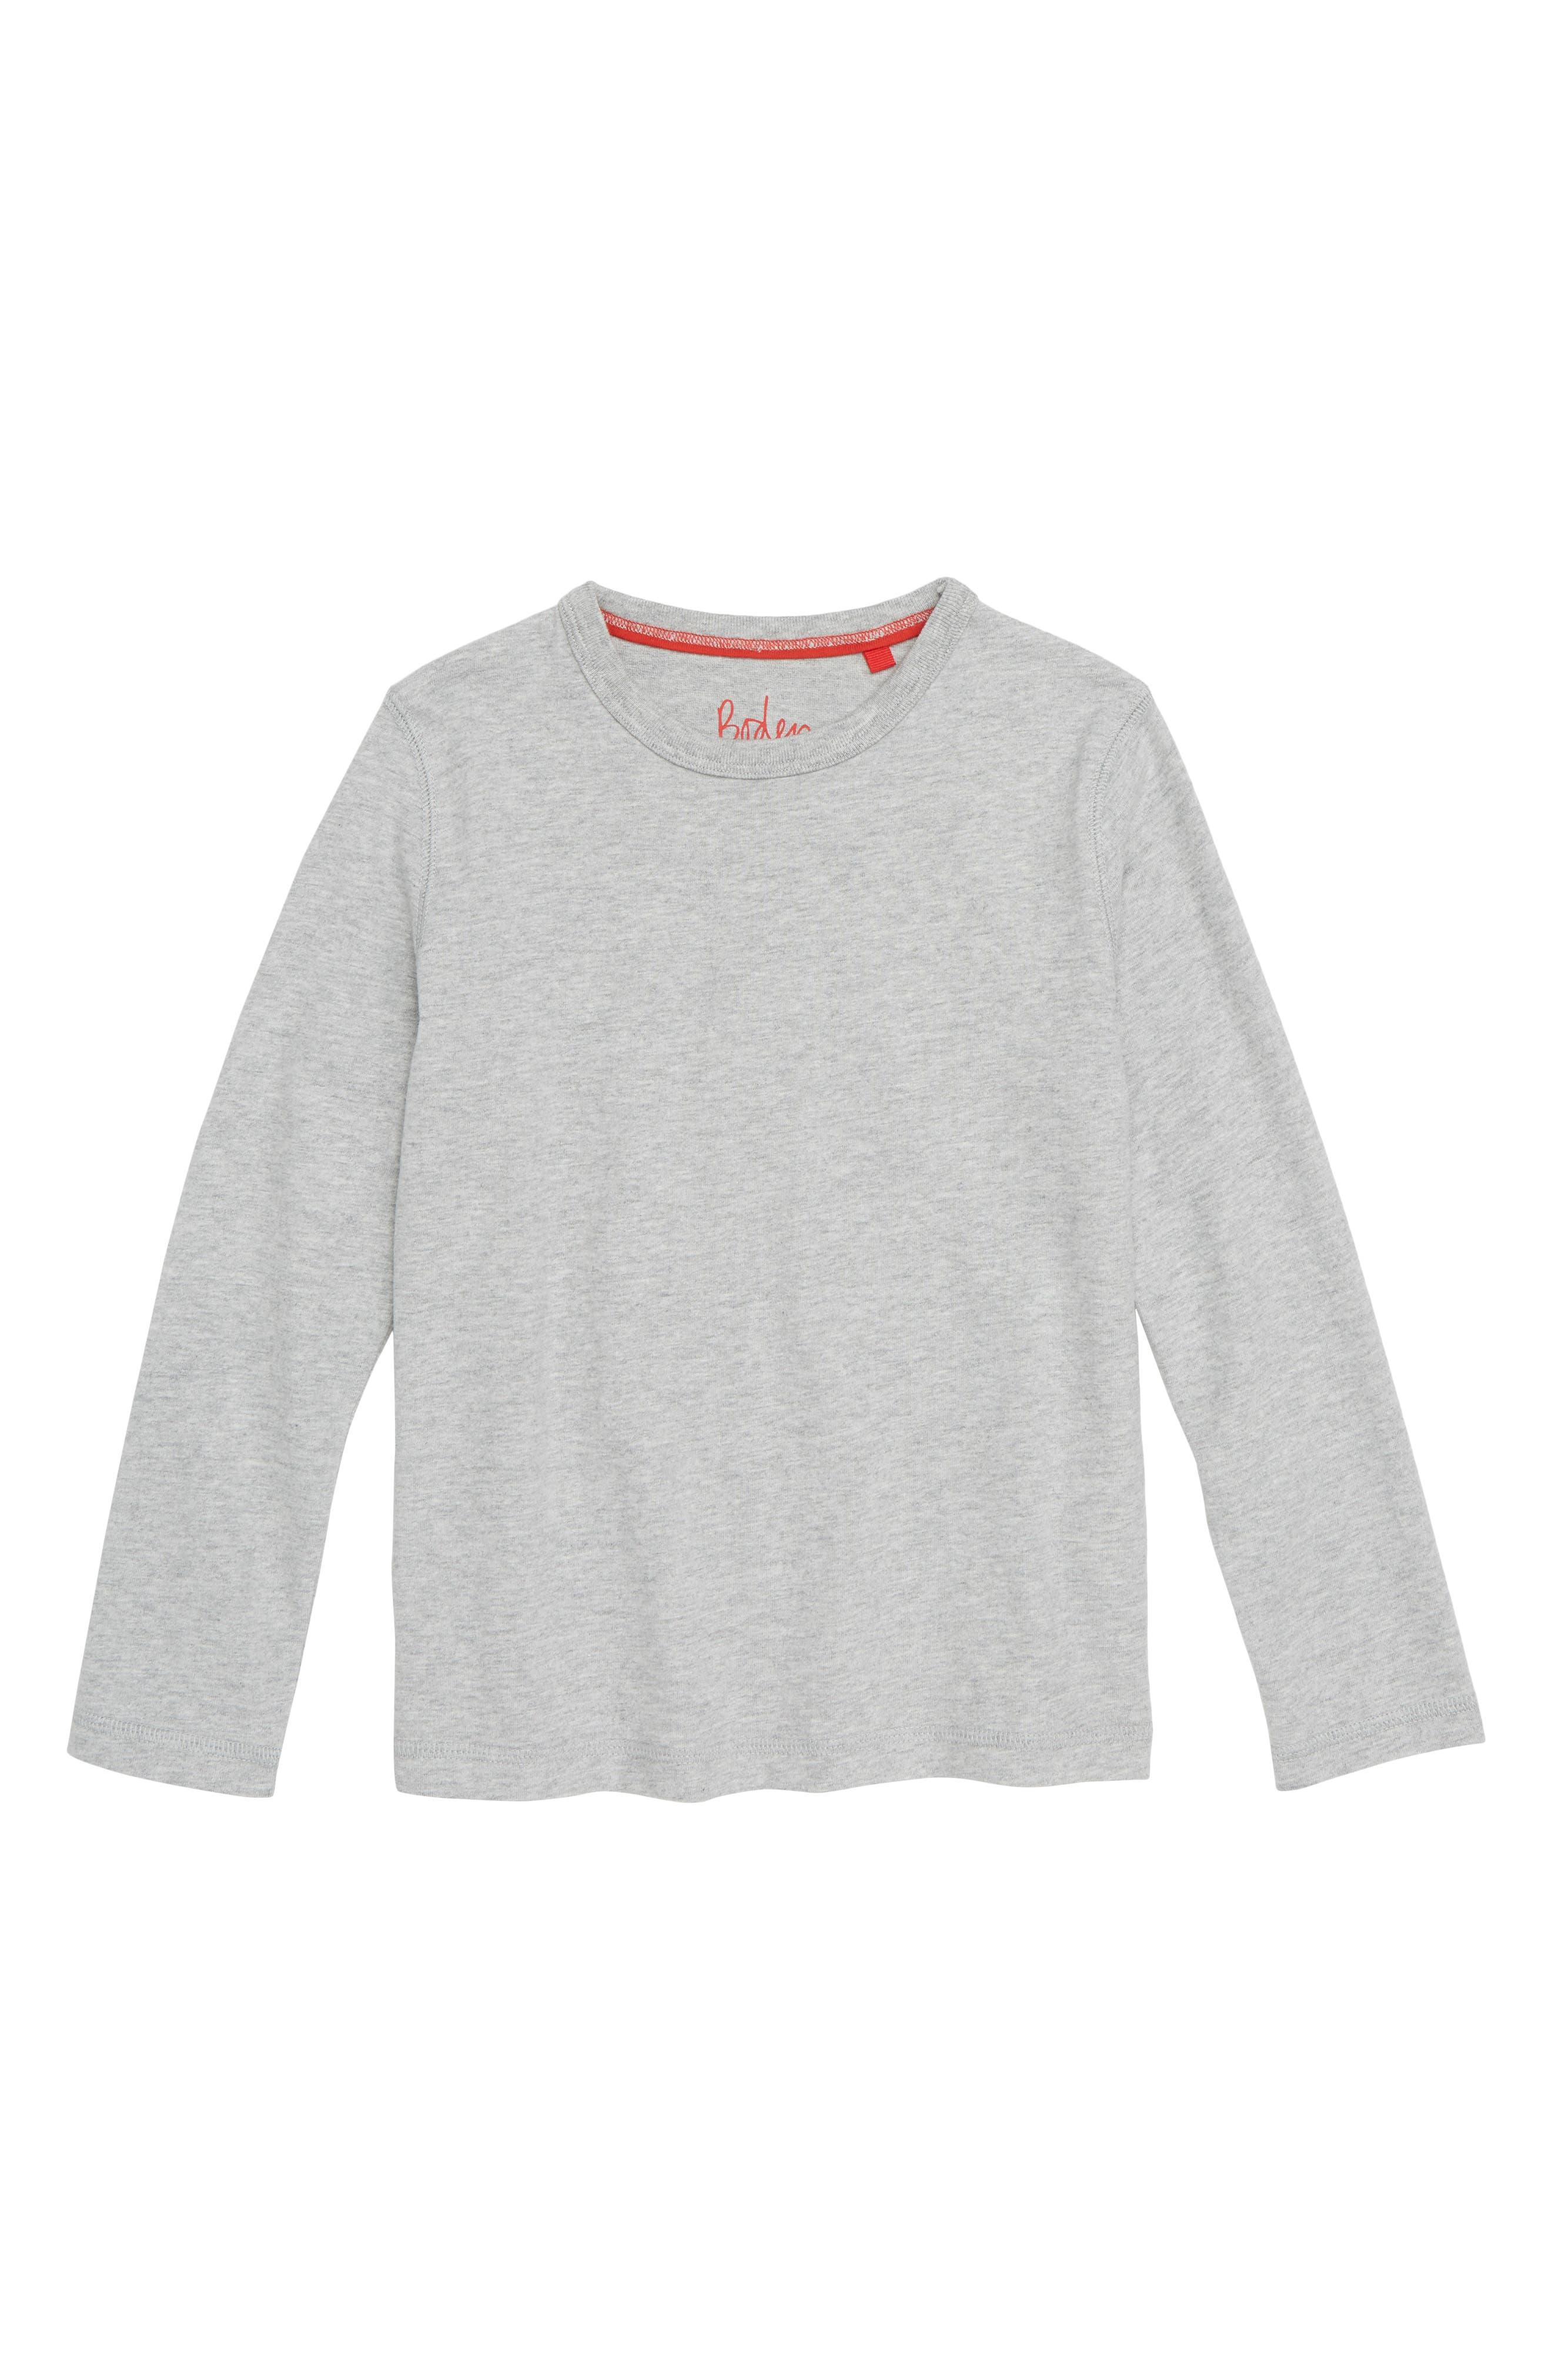 Supersoft Long Sleeve T-Shirt,                             Main thumbnail 1, color,                             054